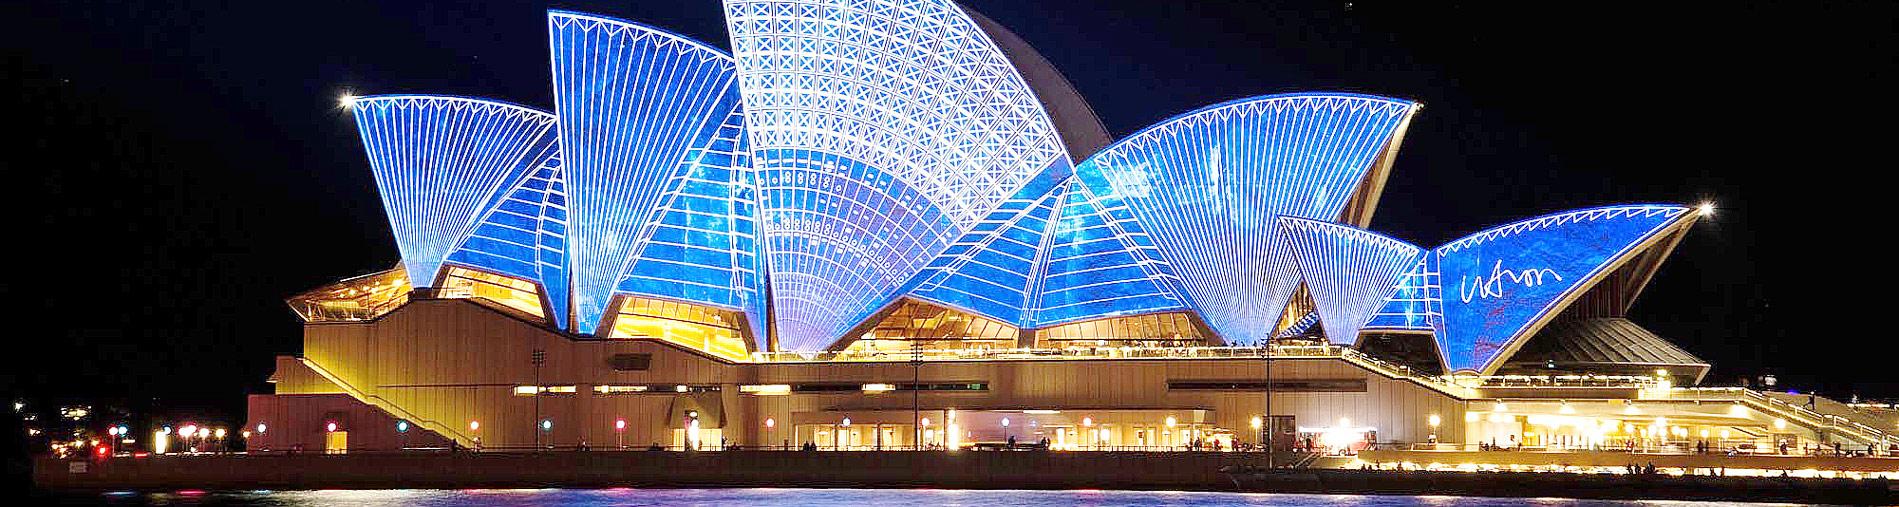 rondreis australie hotels